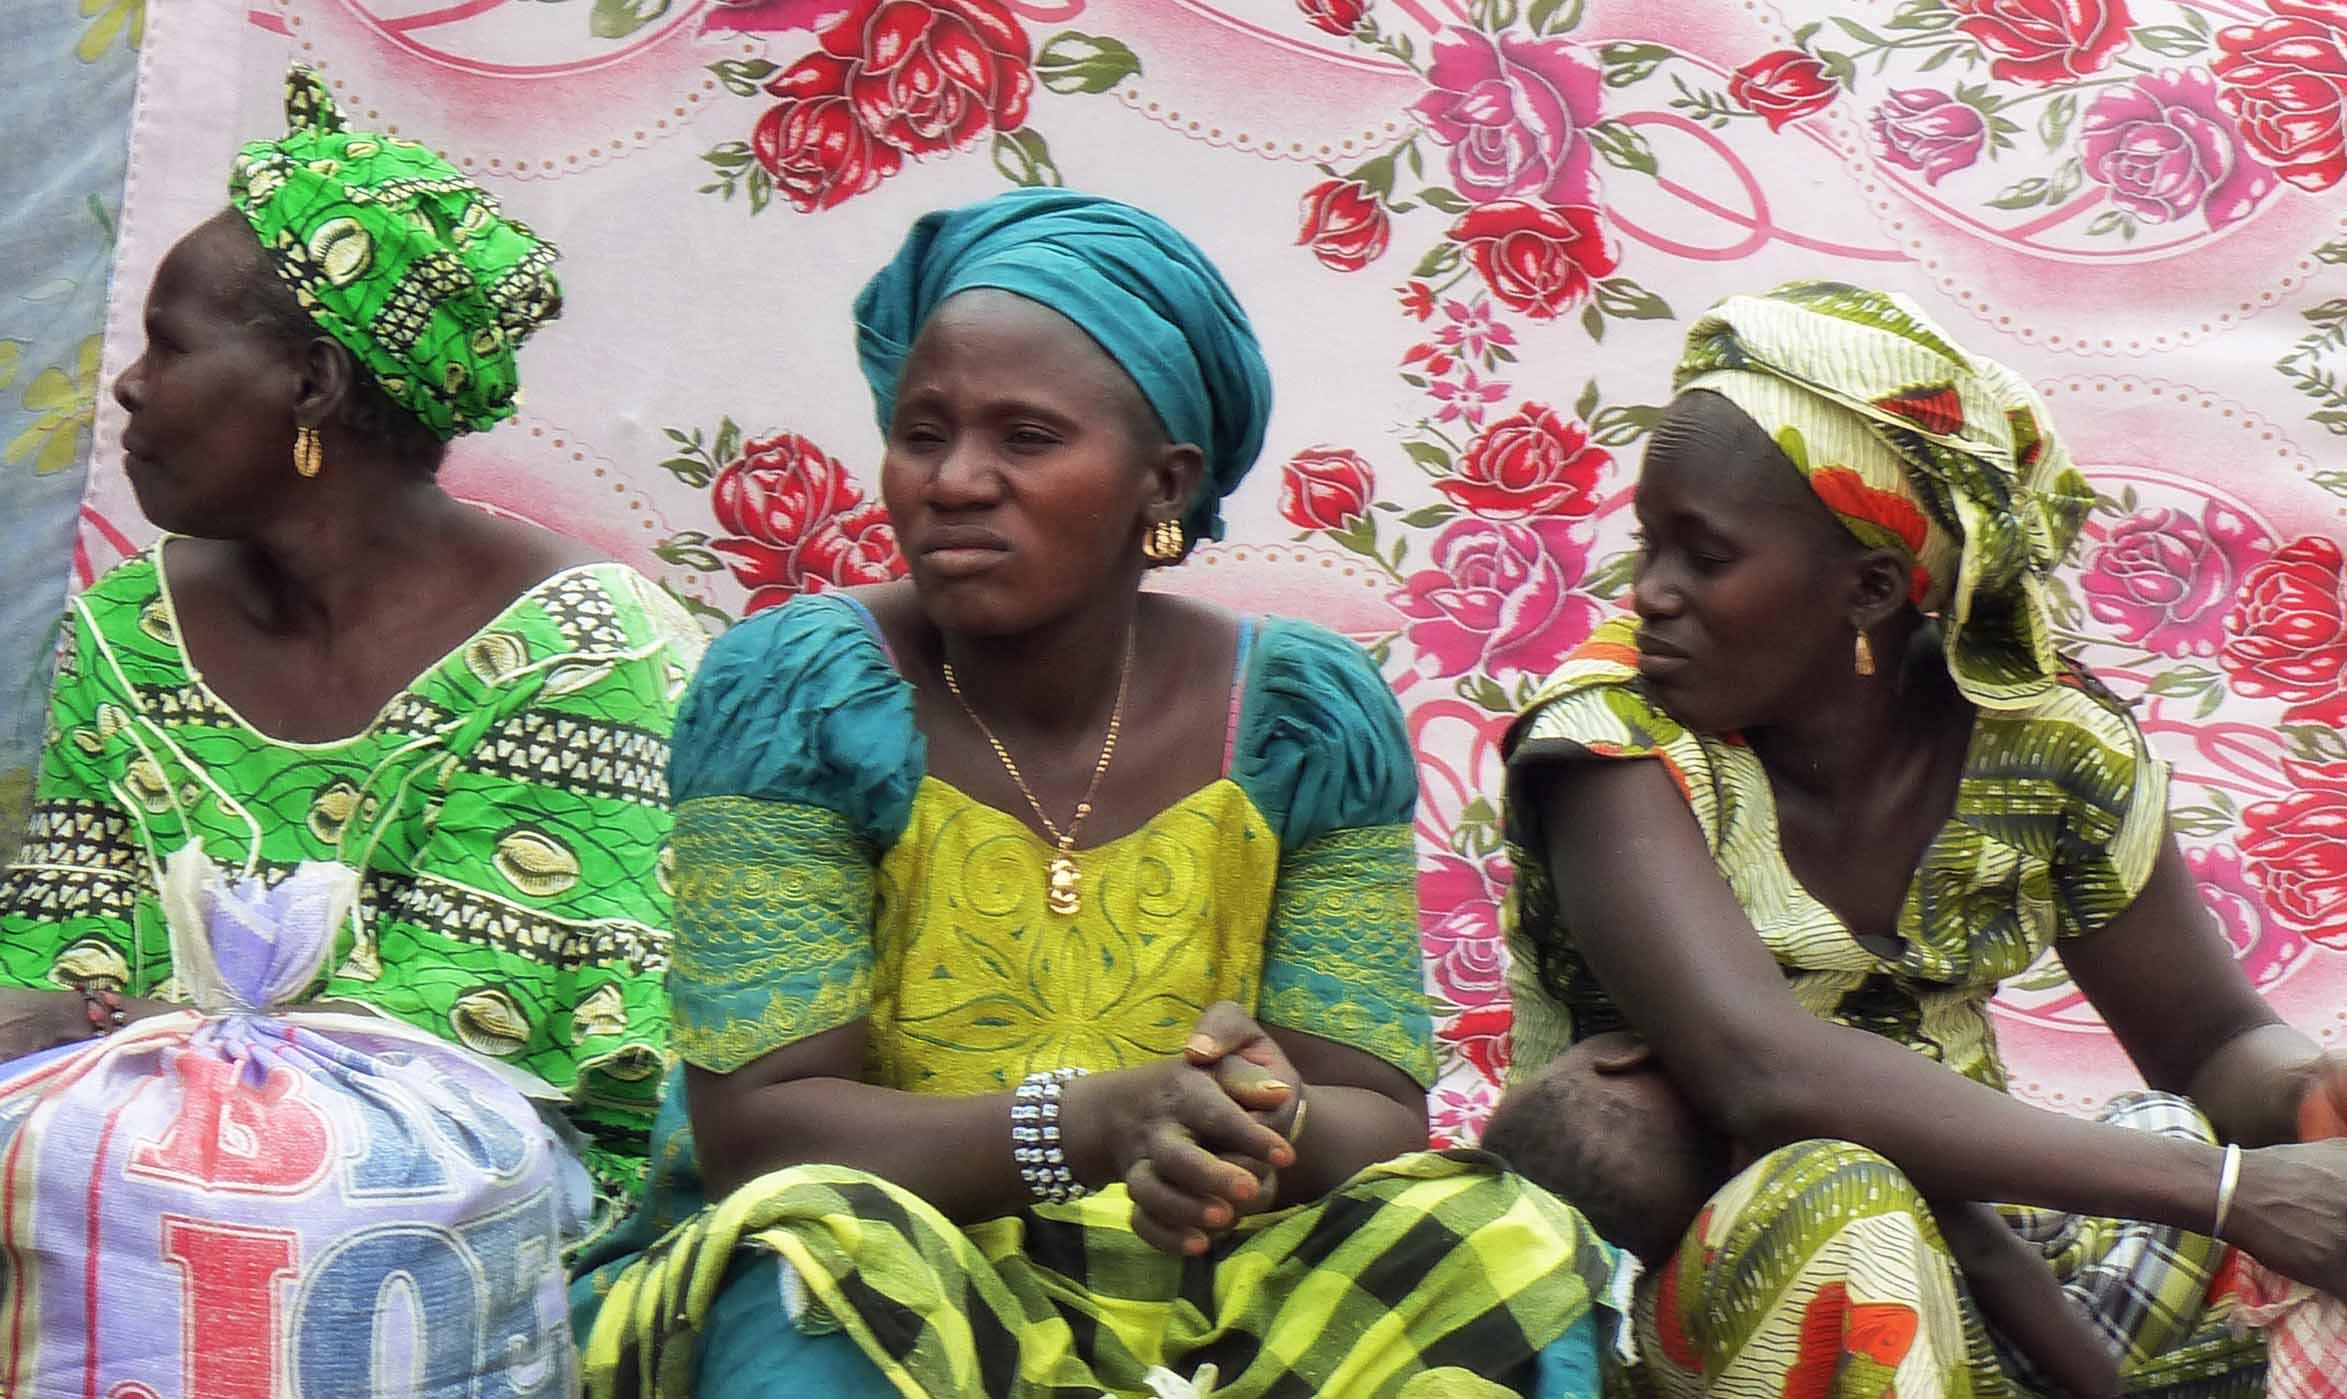 Three ladies in African dress